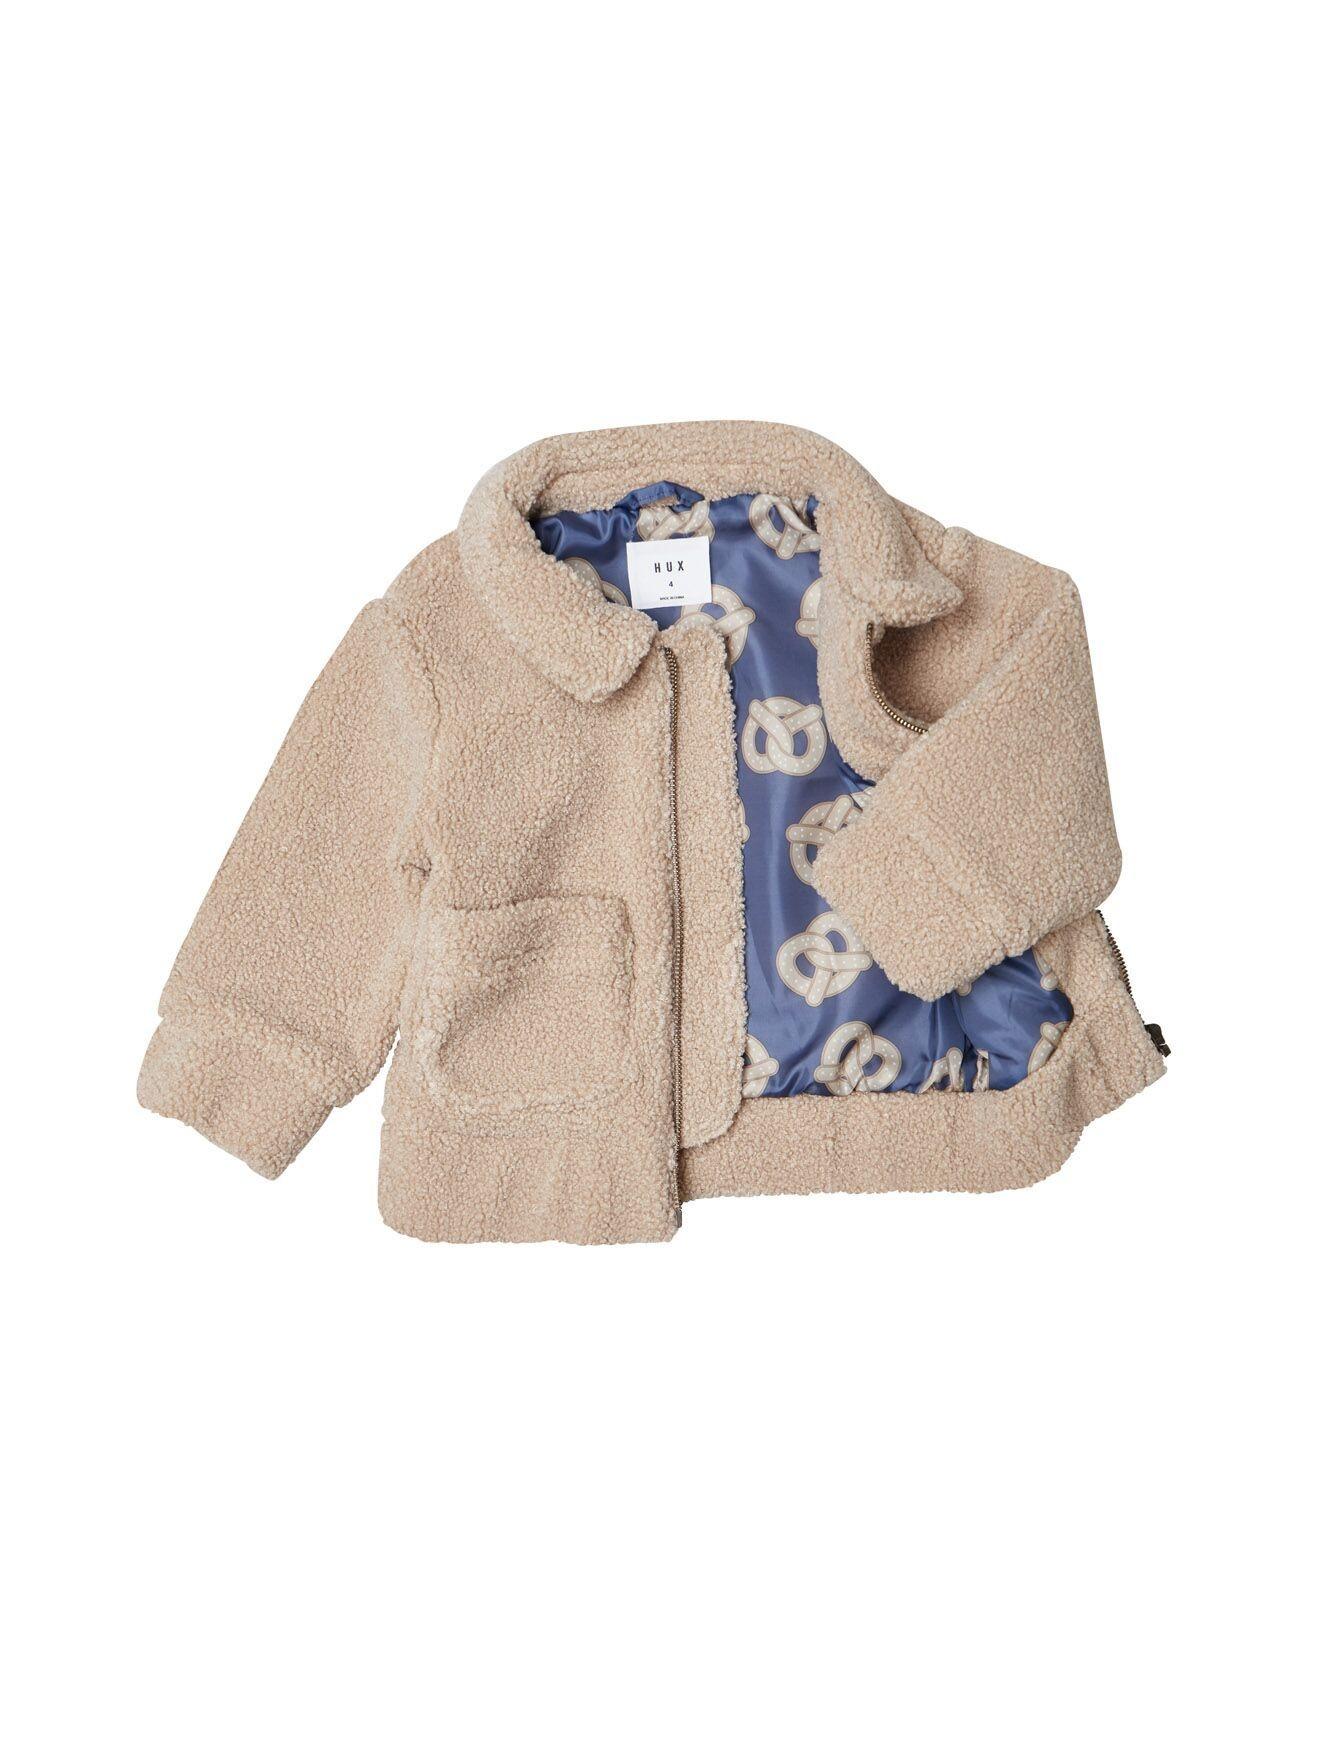 HUX BABY 70's Boucle' Jacket